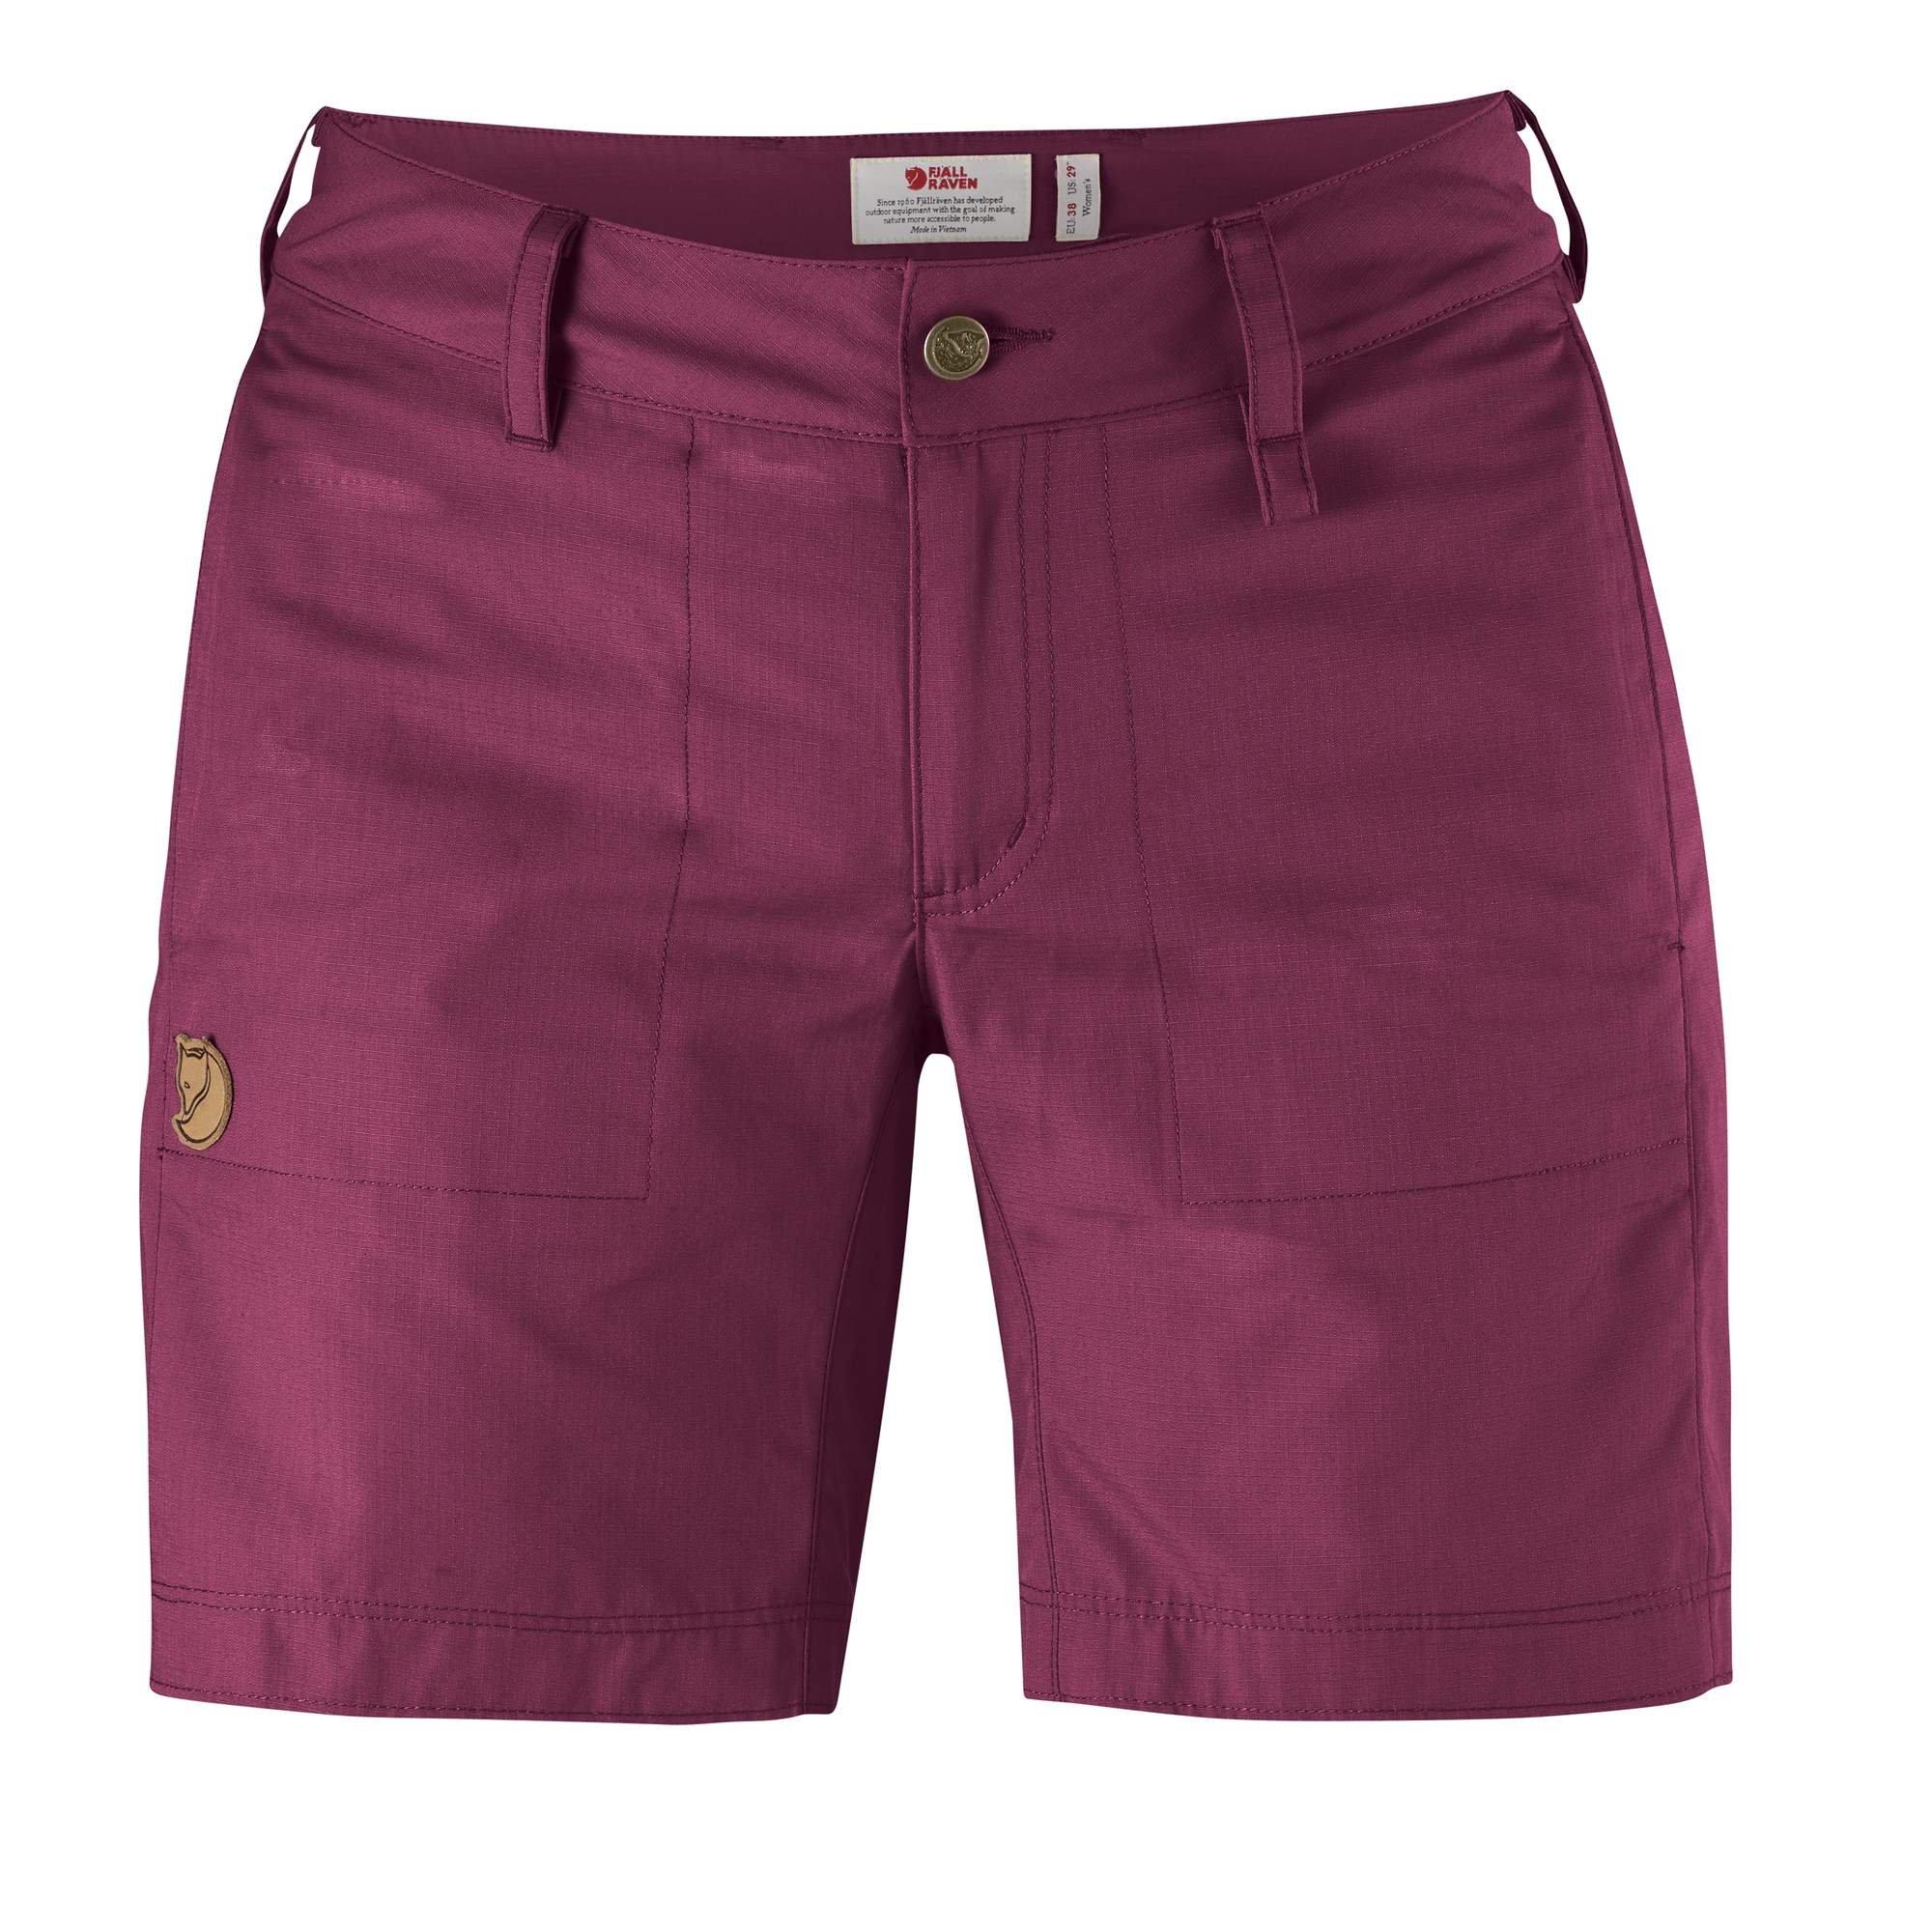 Fjallraven - Women's Abisko Shade Shorts, Plum, 46 by Fjallraven